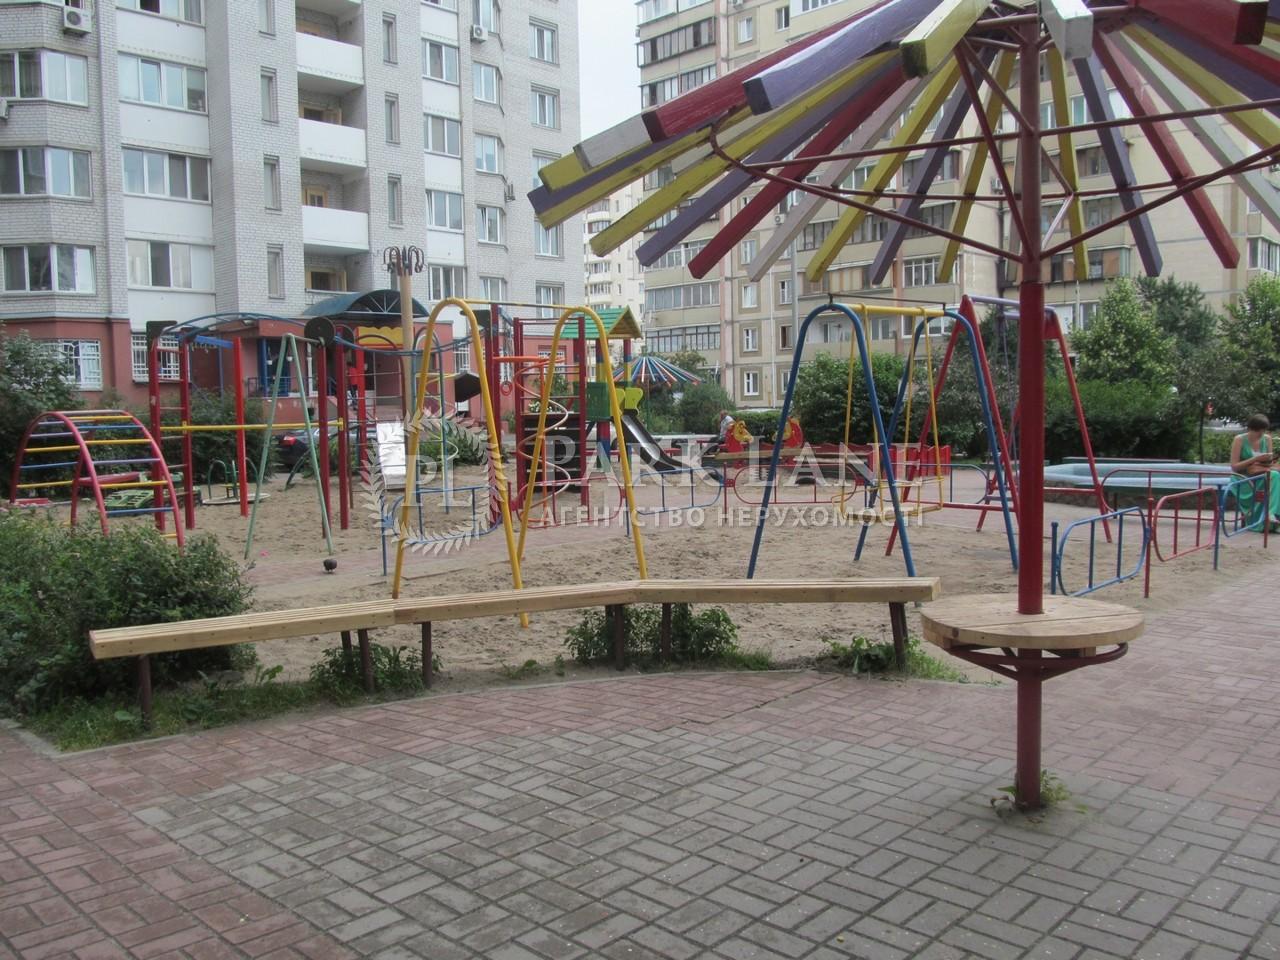 Квартира ул. Прилужная, 4/15, Киев, B-89391 - Фото 4